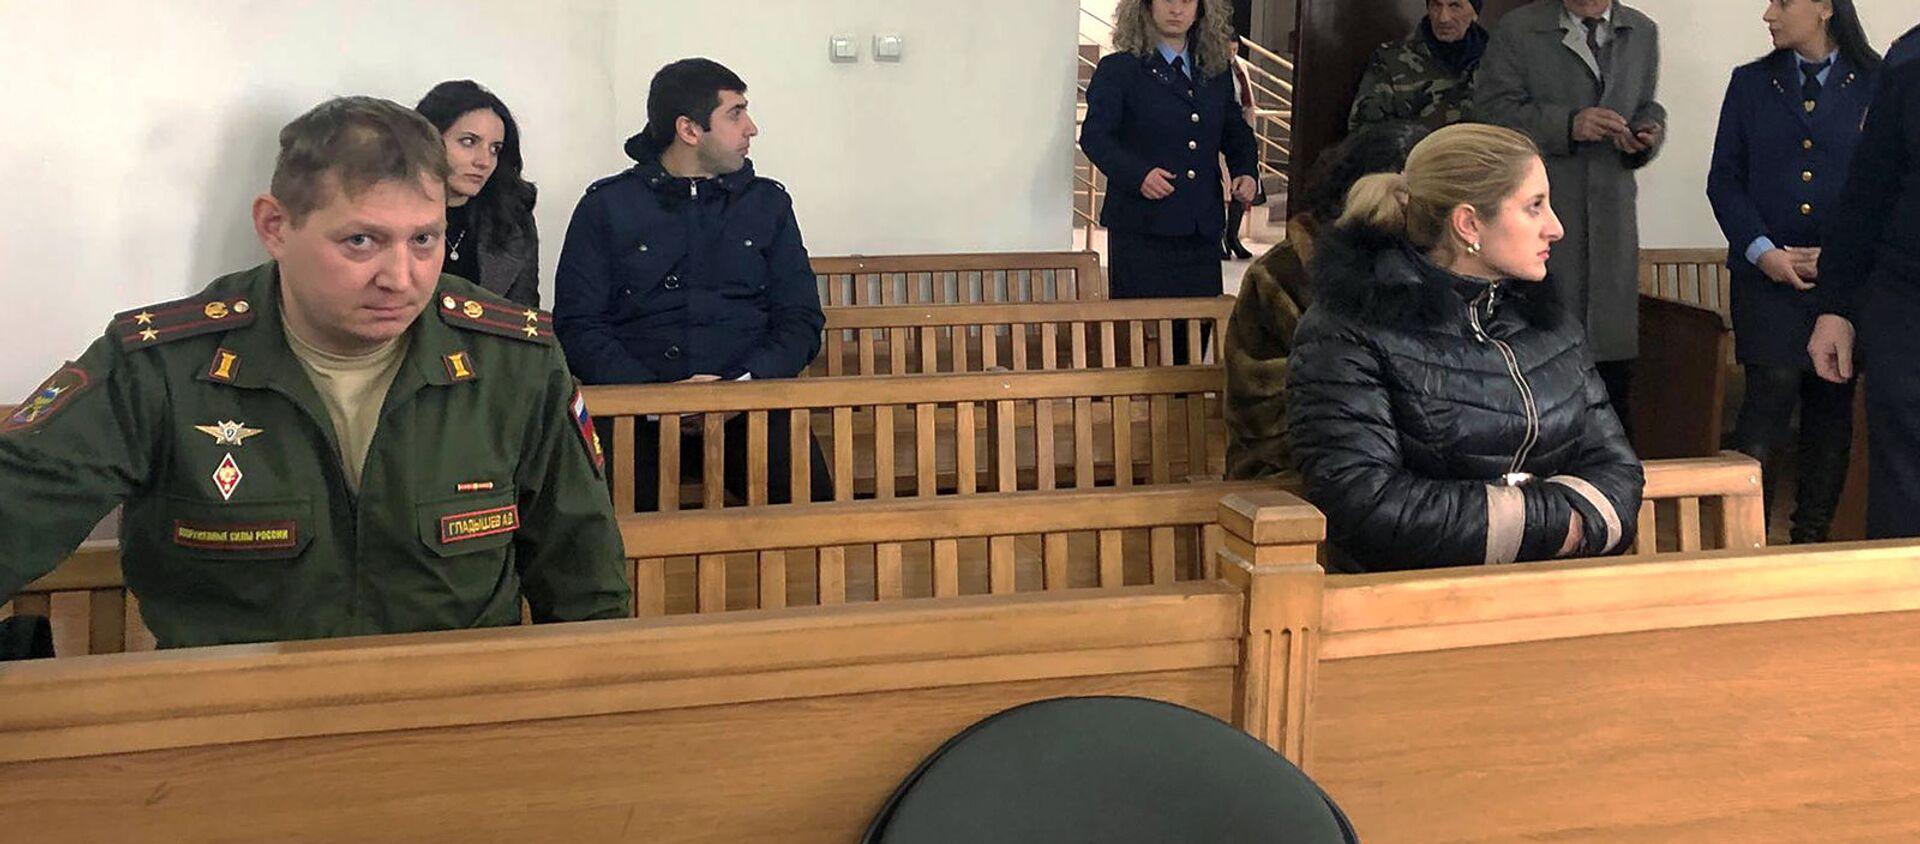 Судебное заседание по делу смерти Джулиетты Гукасян (4 февраля 2020). Гюмри - Sputnik Արմենիա, 1920, 04.02.2020